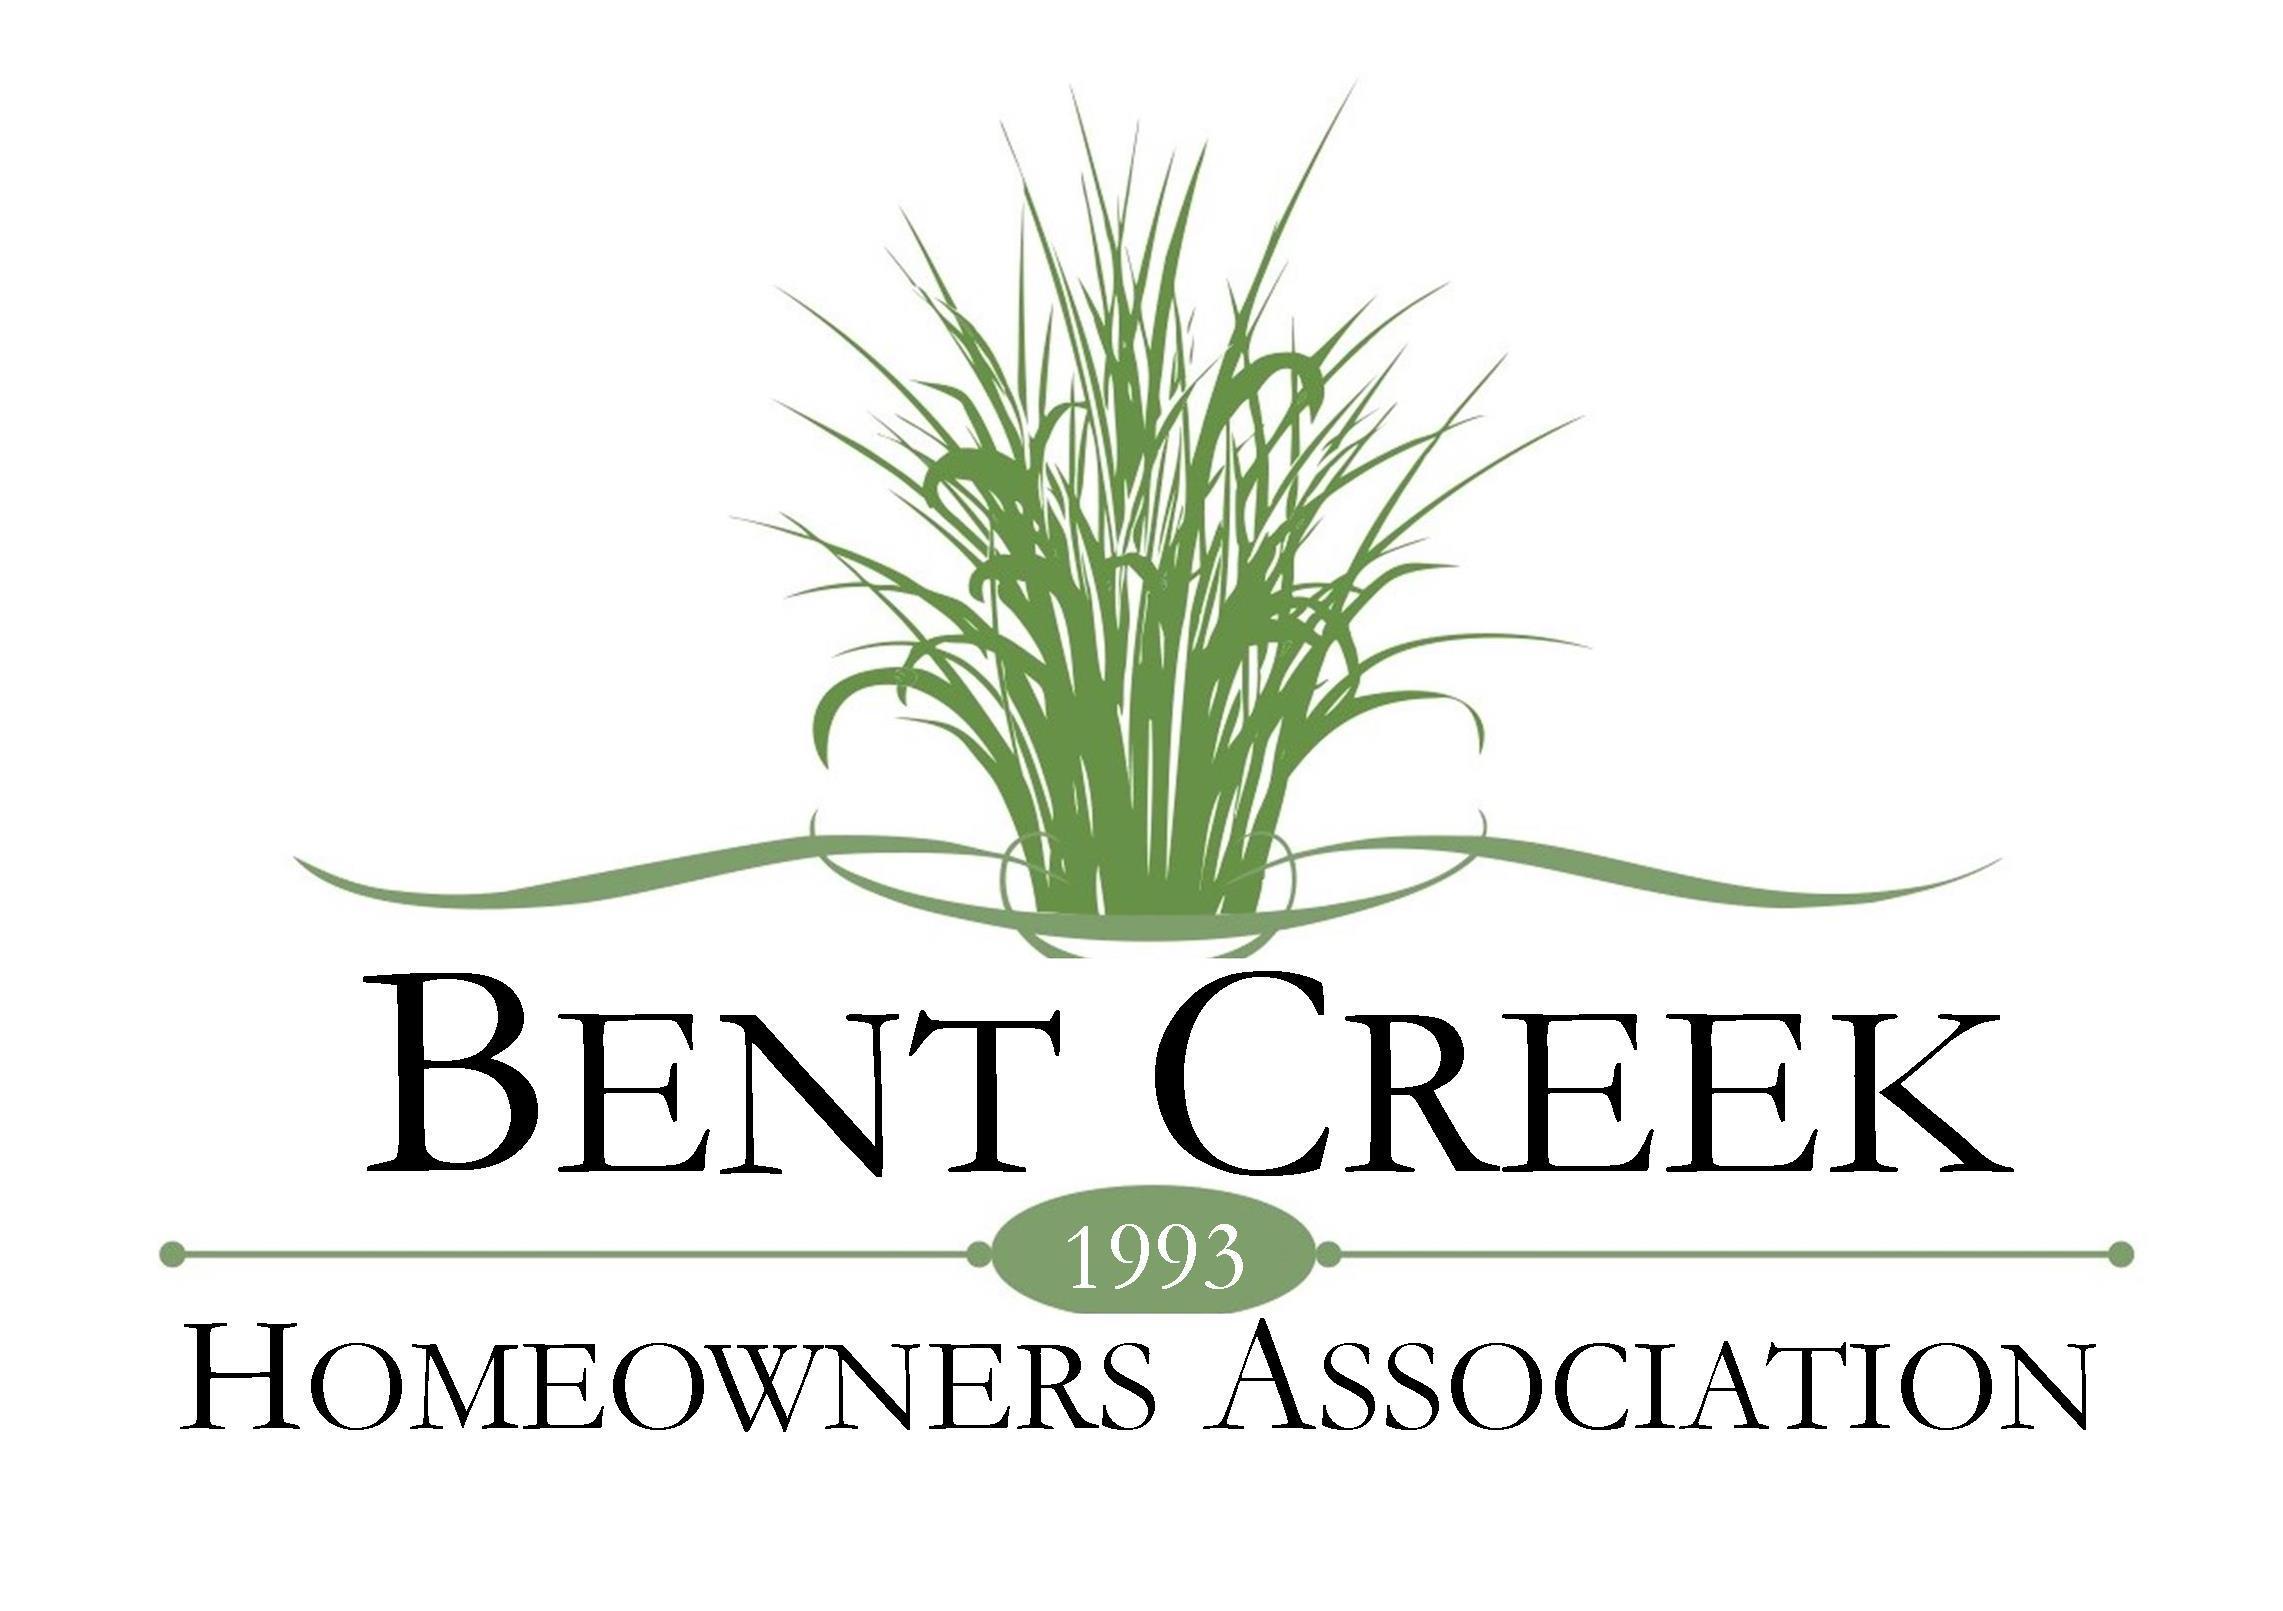 Bent Creek Homeowners Association